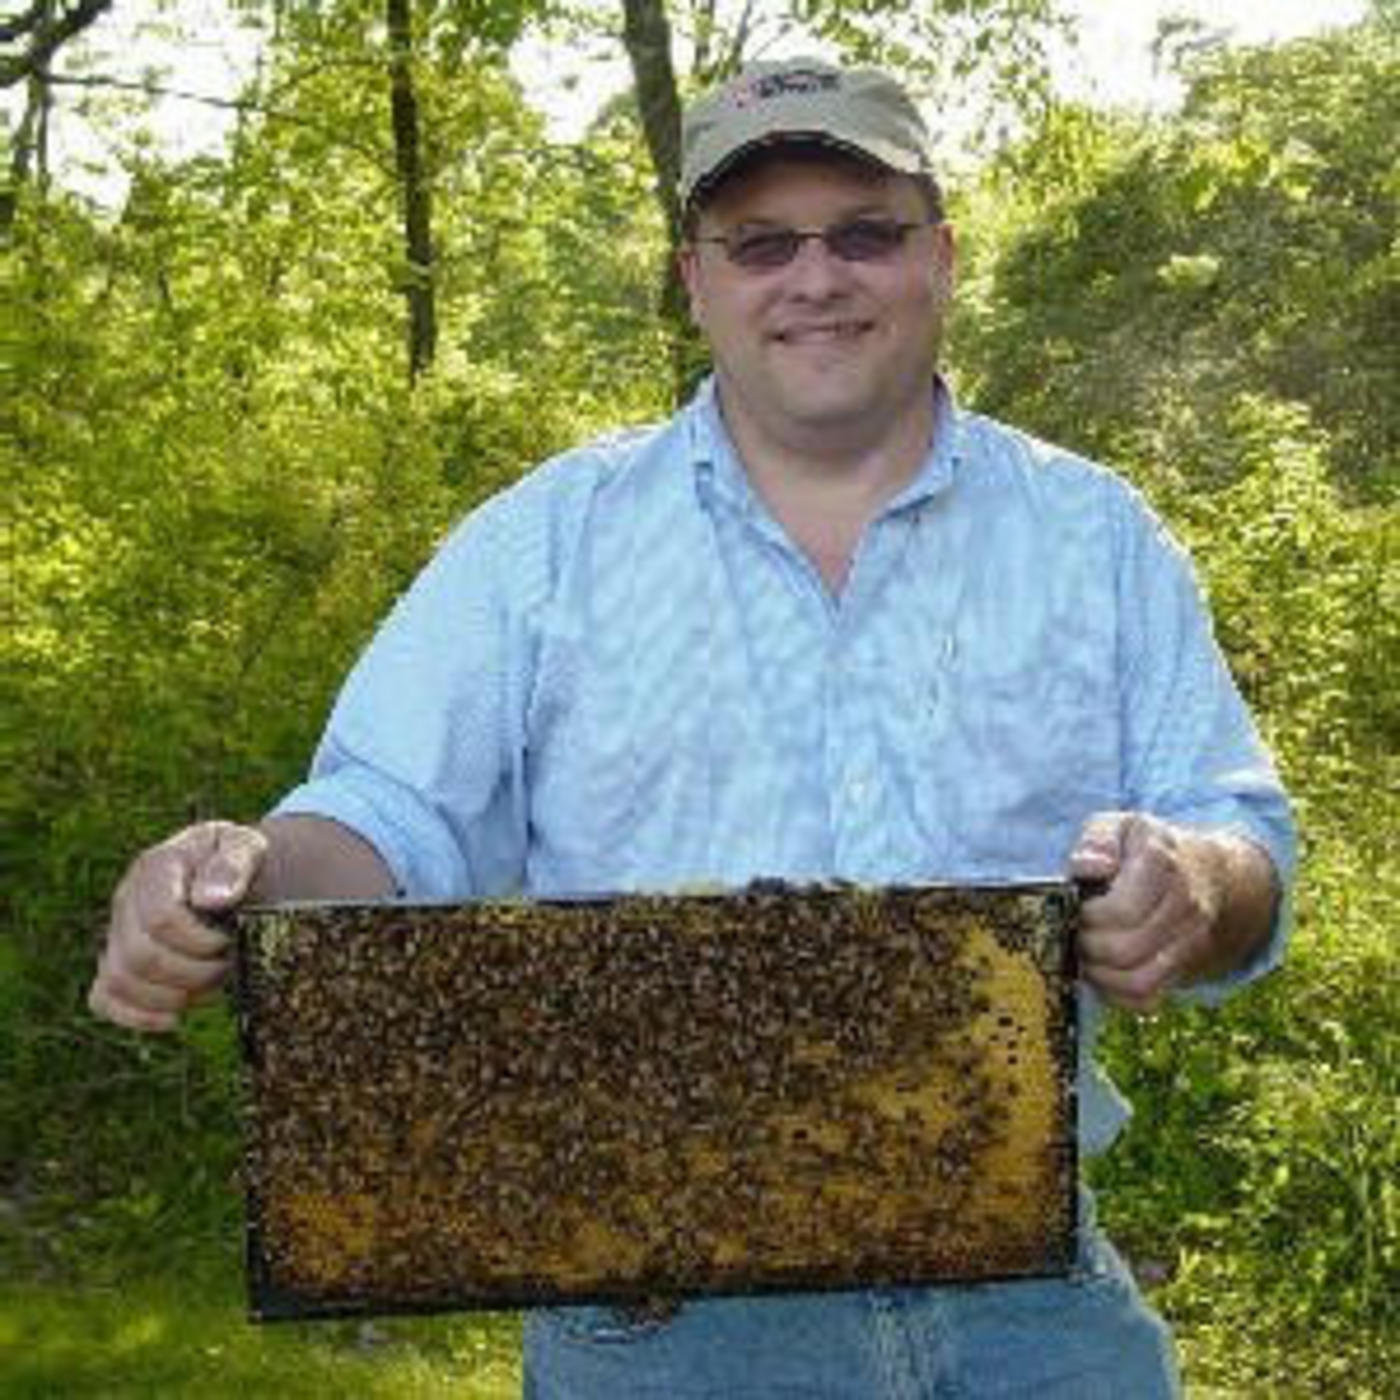 EPISODE14 - Honey Bee Man, Types of Honey